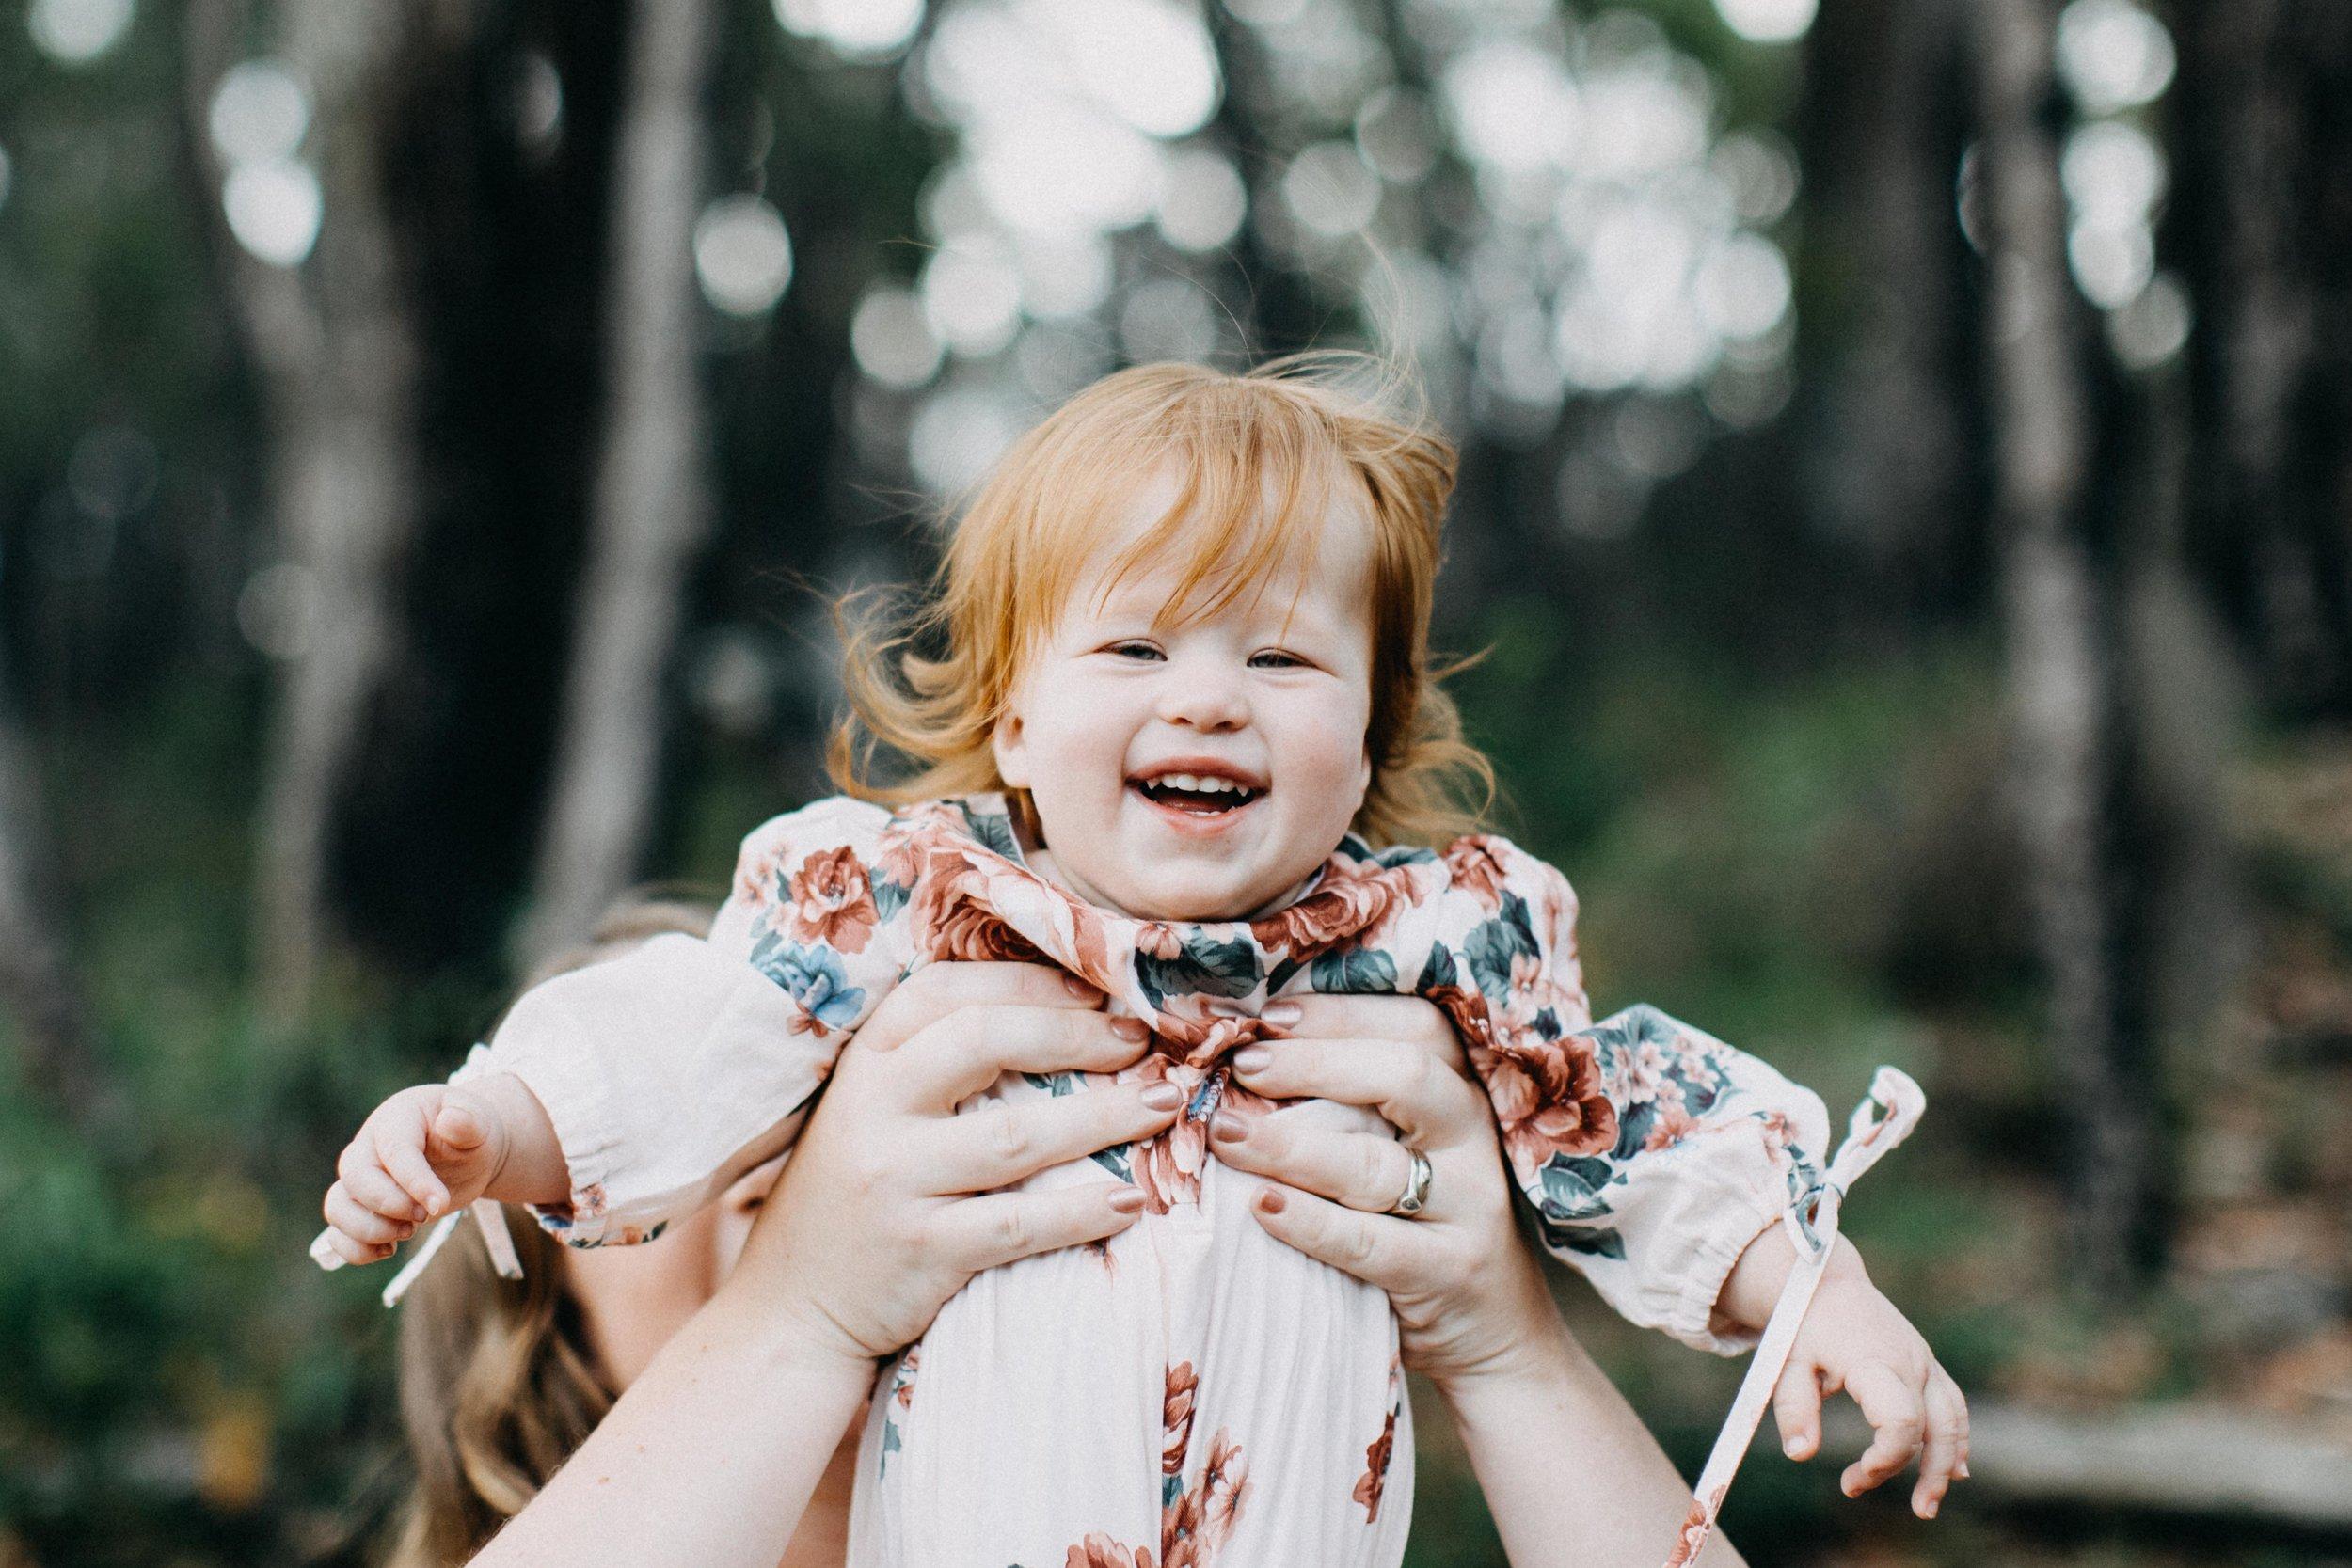 southern-highlands-maternity-photography-macarthur-ruth-www.emilyobrienphotography.net-16.jpg